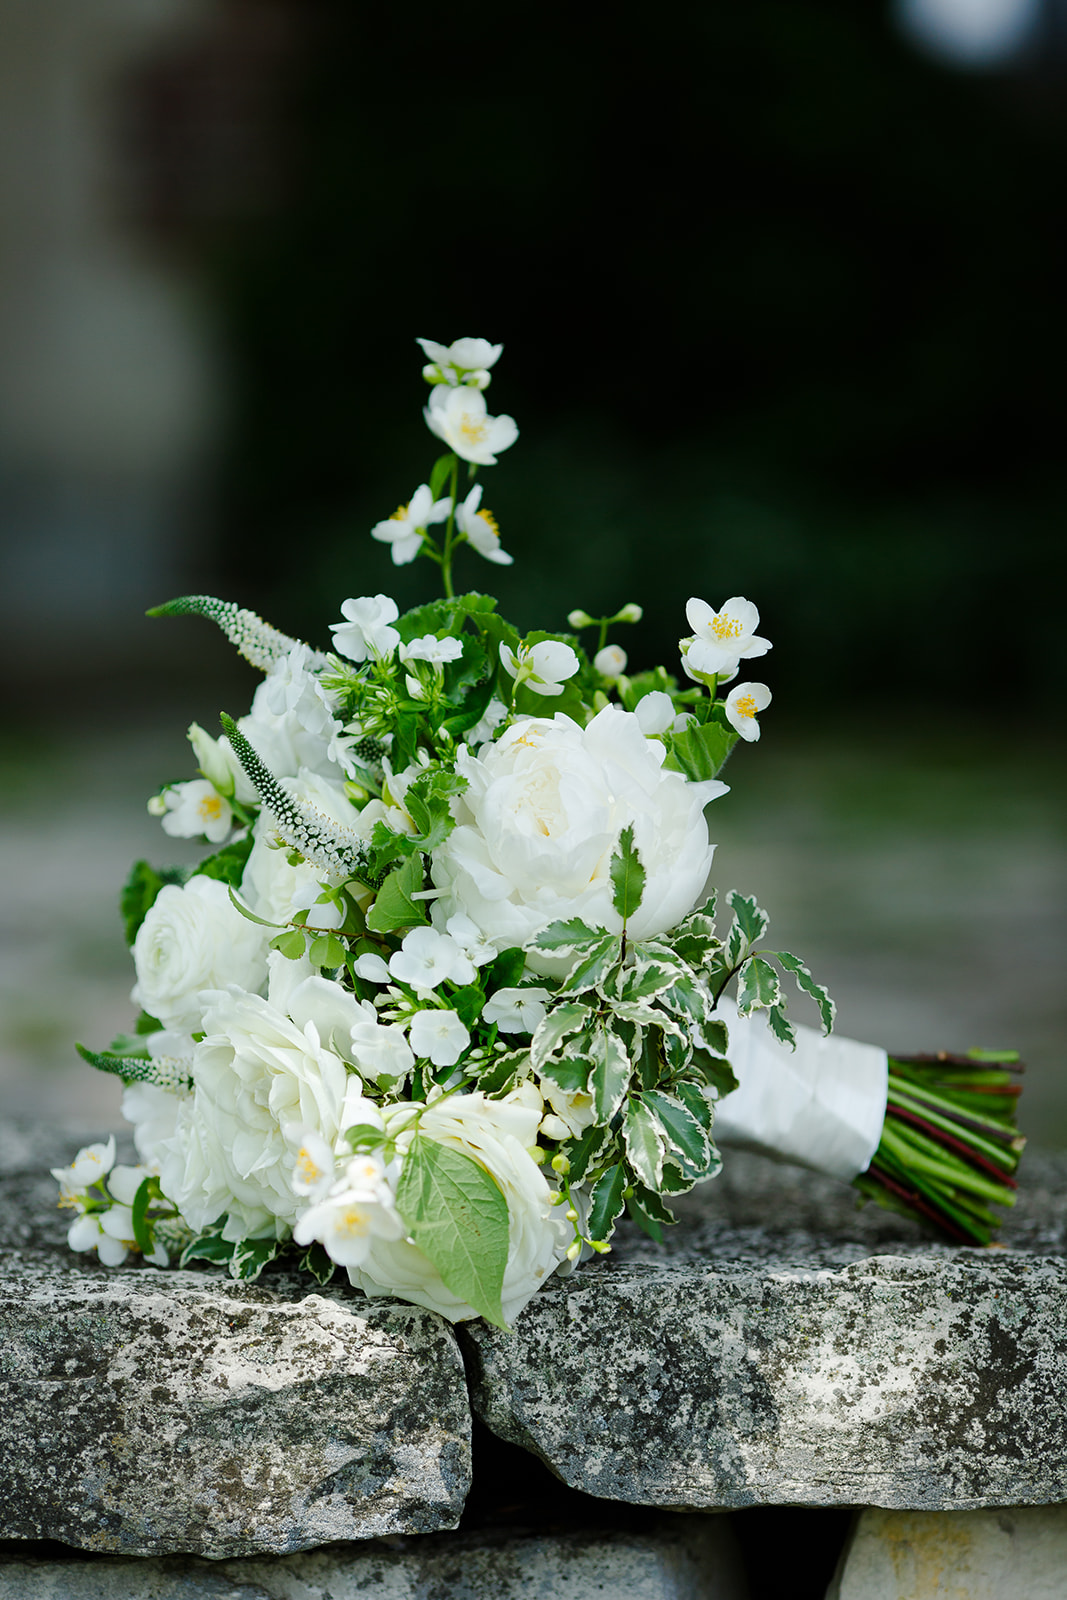 Bridal bouquet by HMR Designs at Riverbend